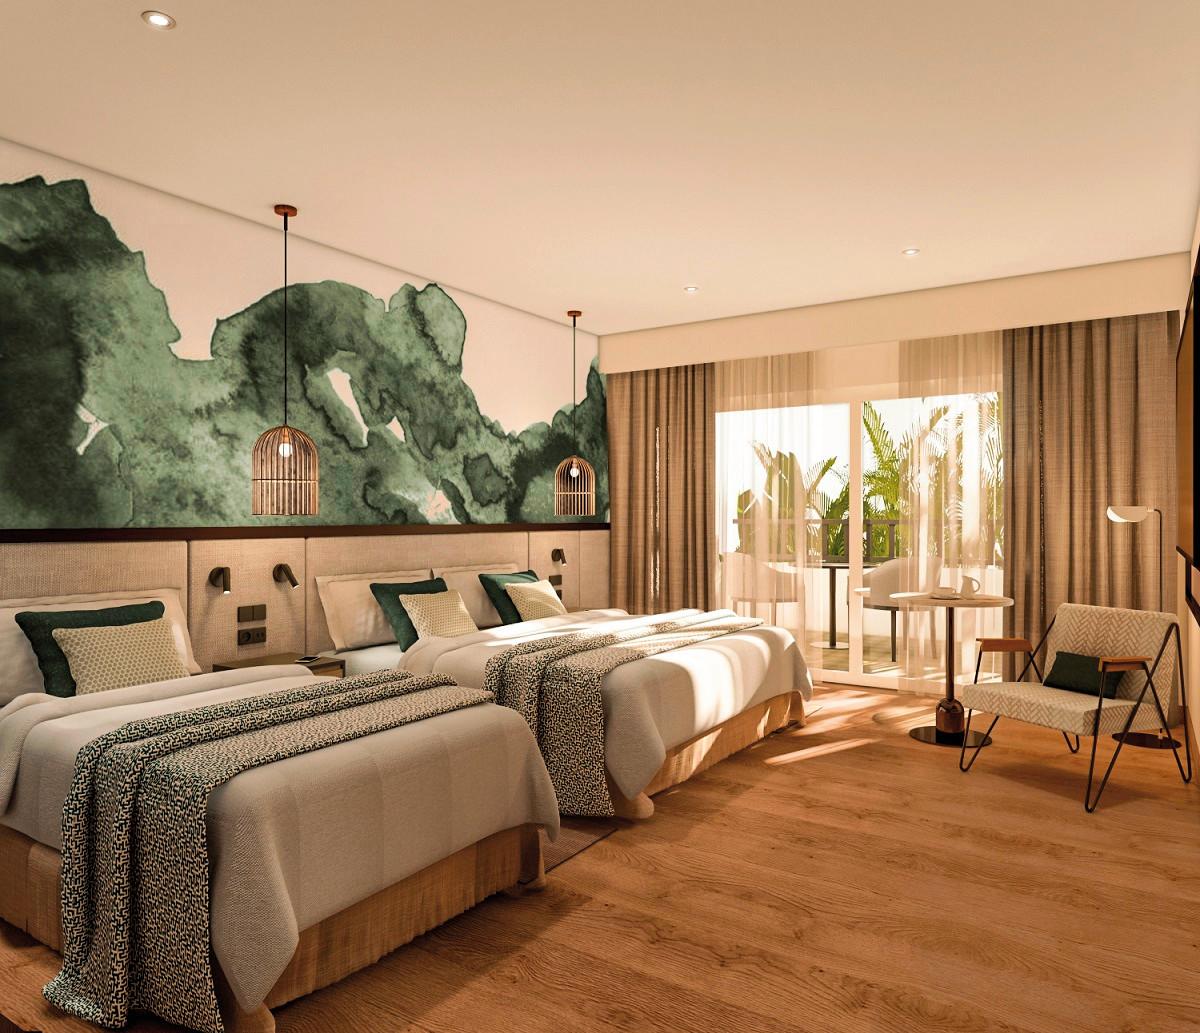 Hotel NH Hesperia Playa Dorada 4